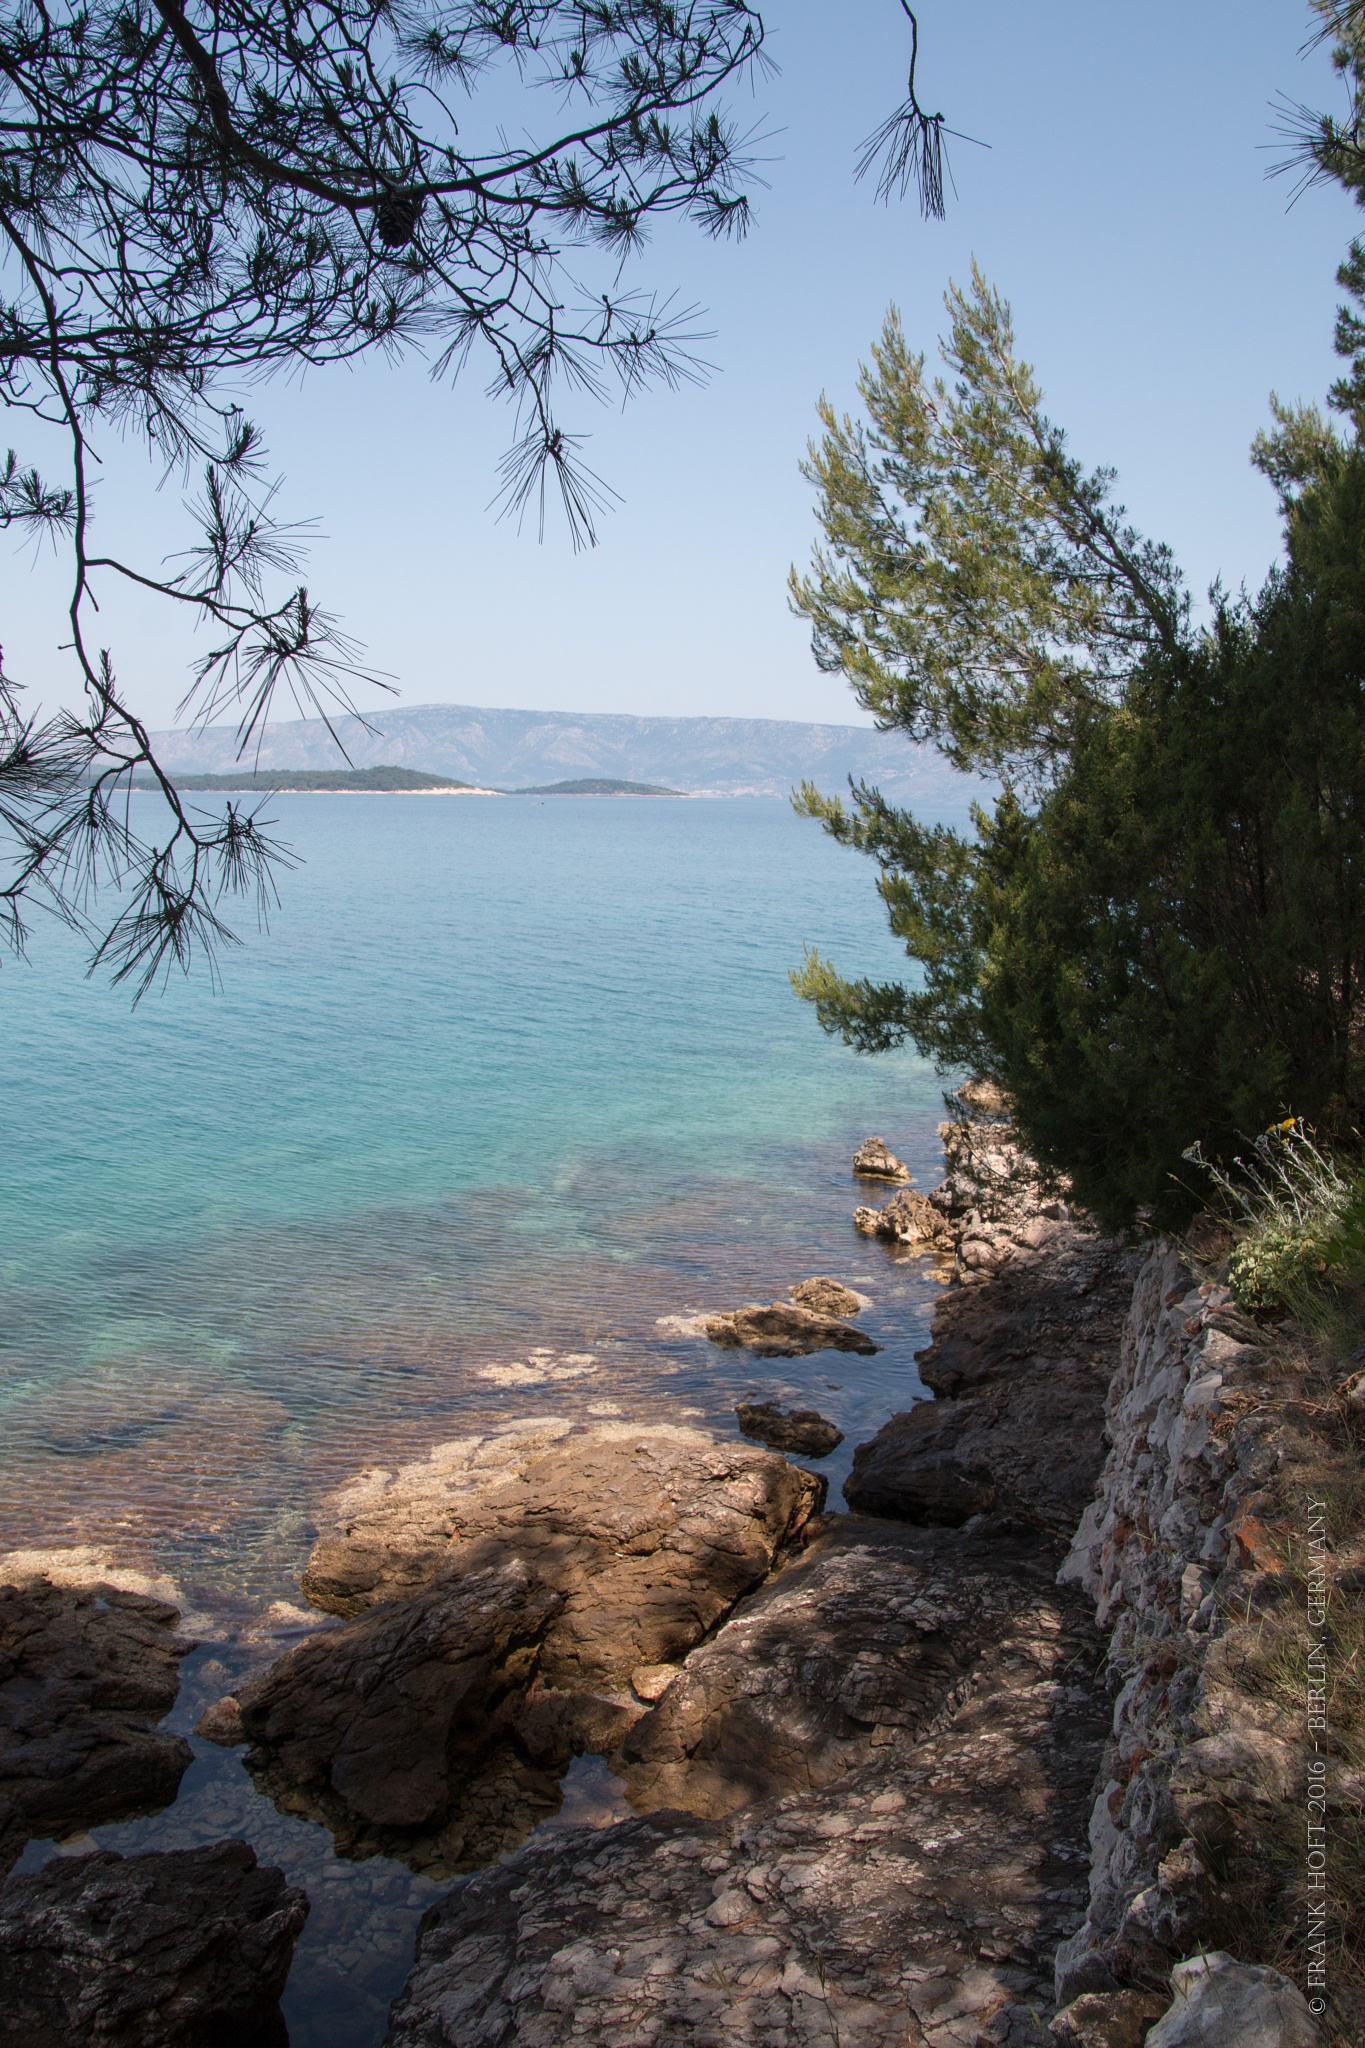 Holiday in Croatia by Frank Höft